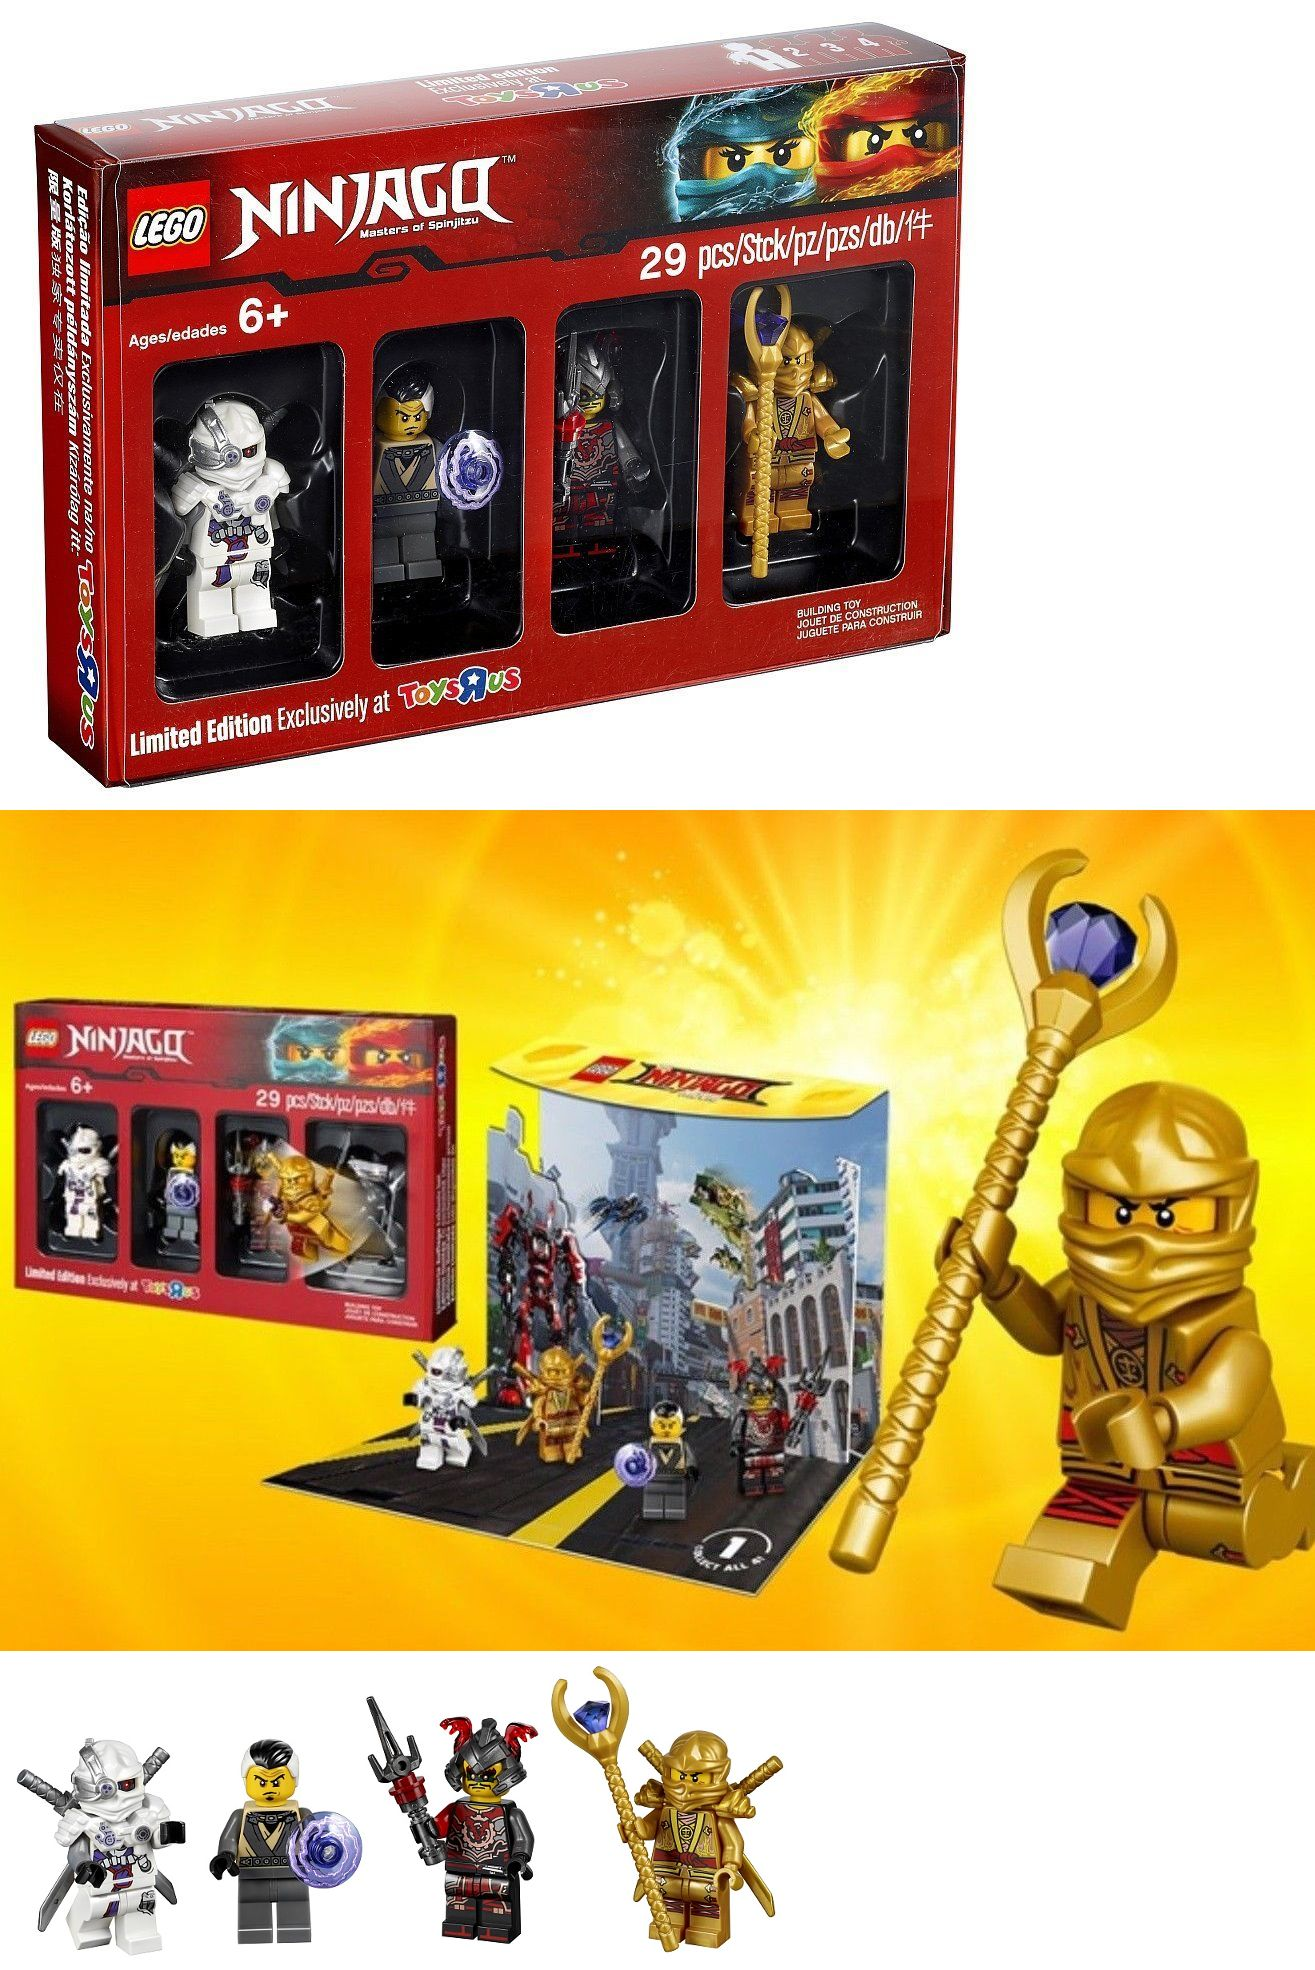 Building Toys 183446 Lego Ninjago Minifigure Set 5004938